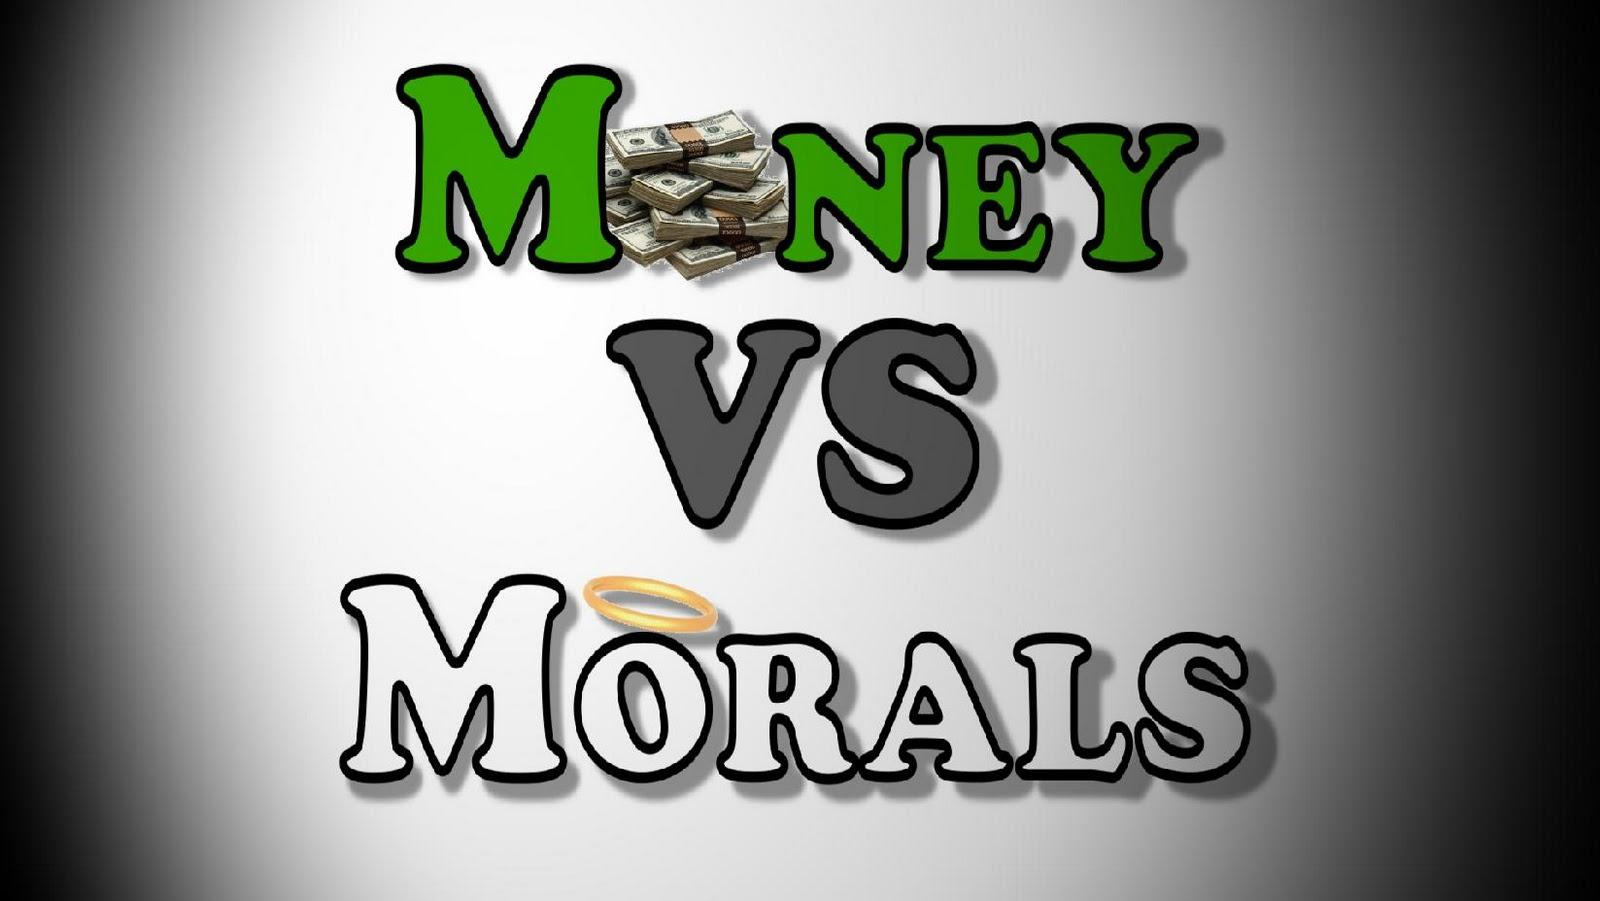 Morality Forum